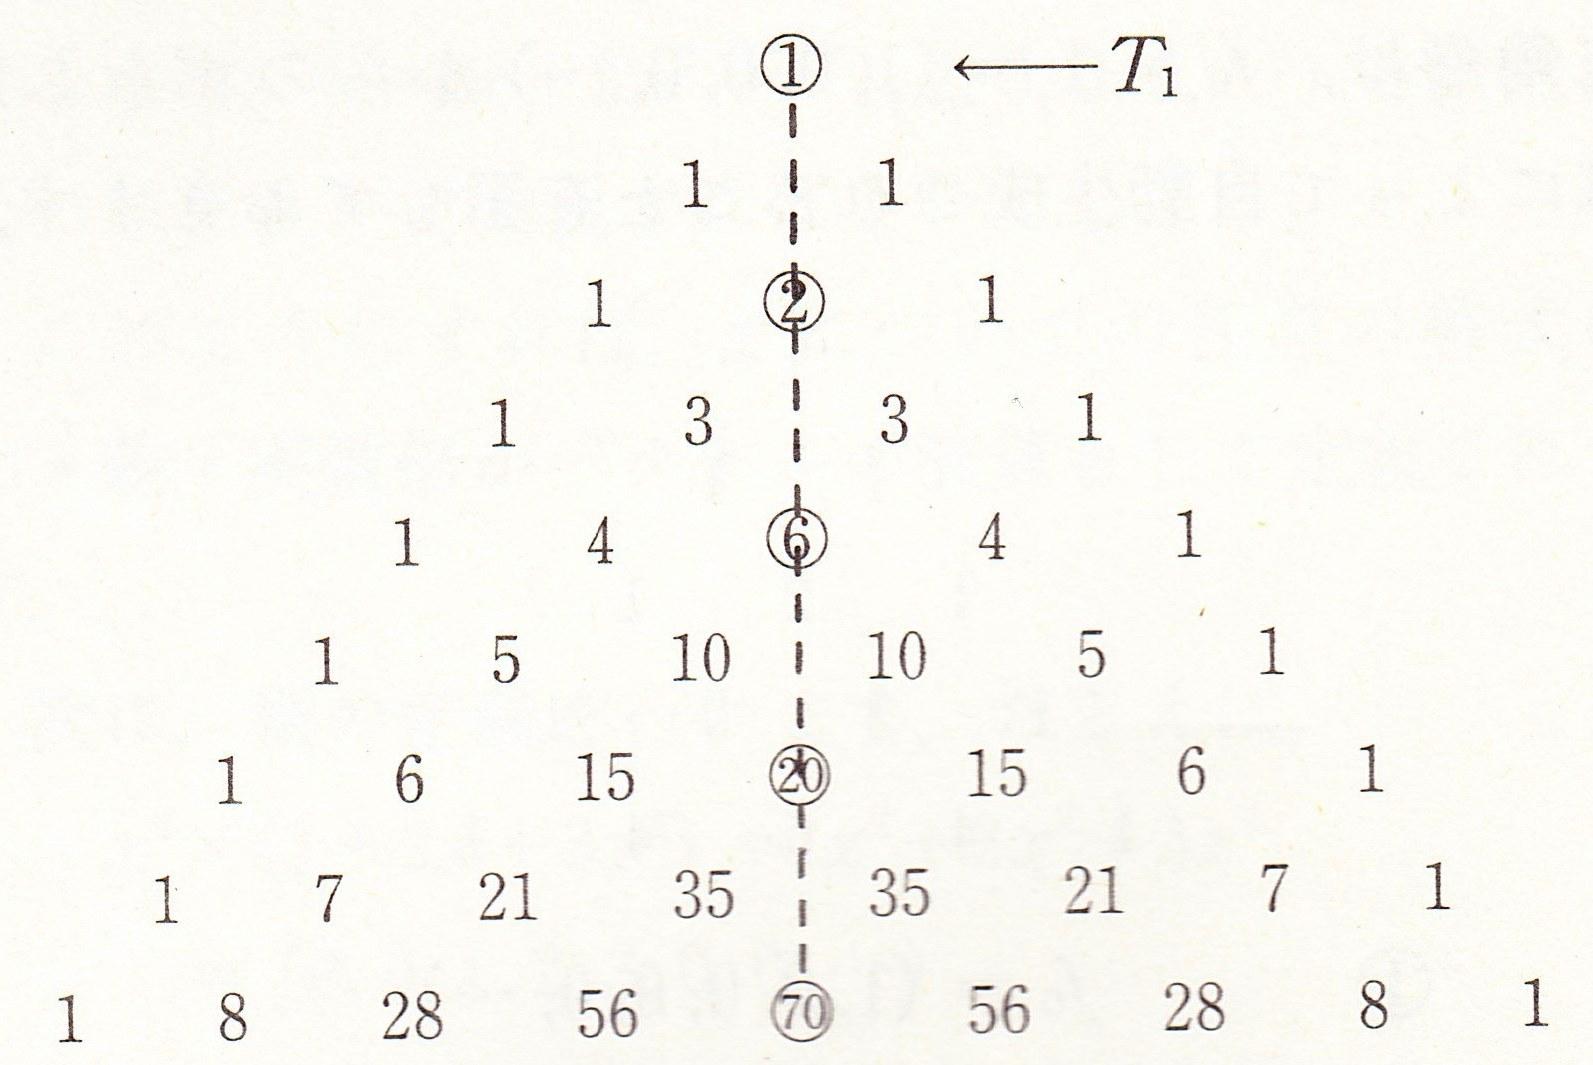 pascal-t-01.jpg